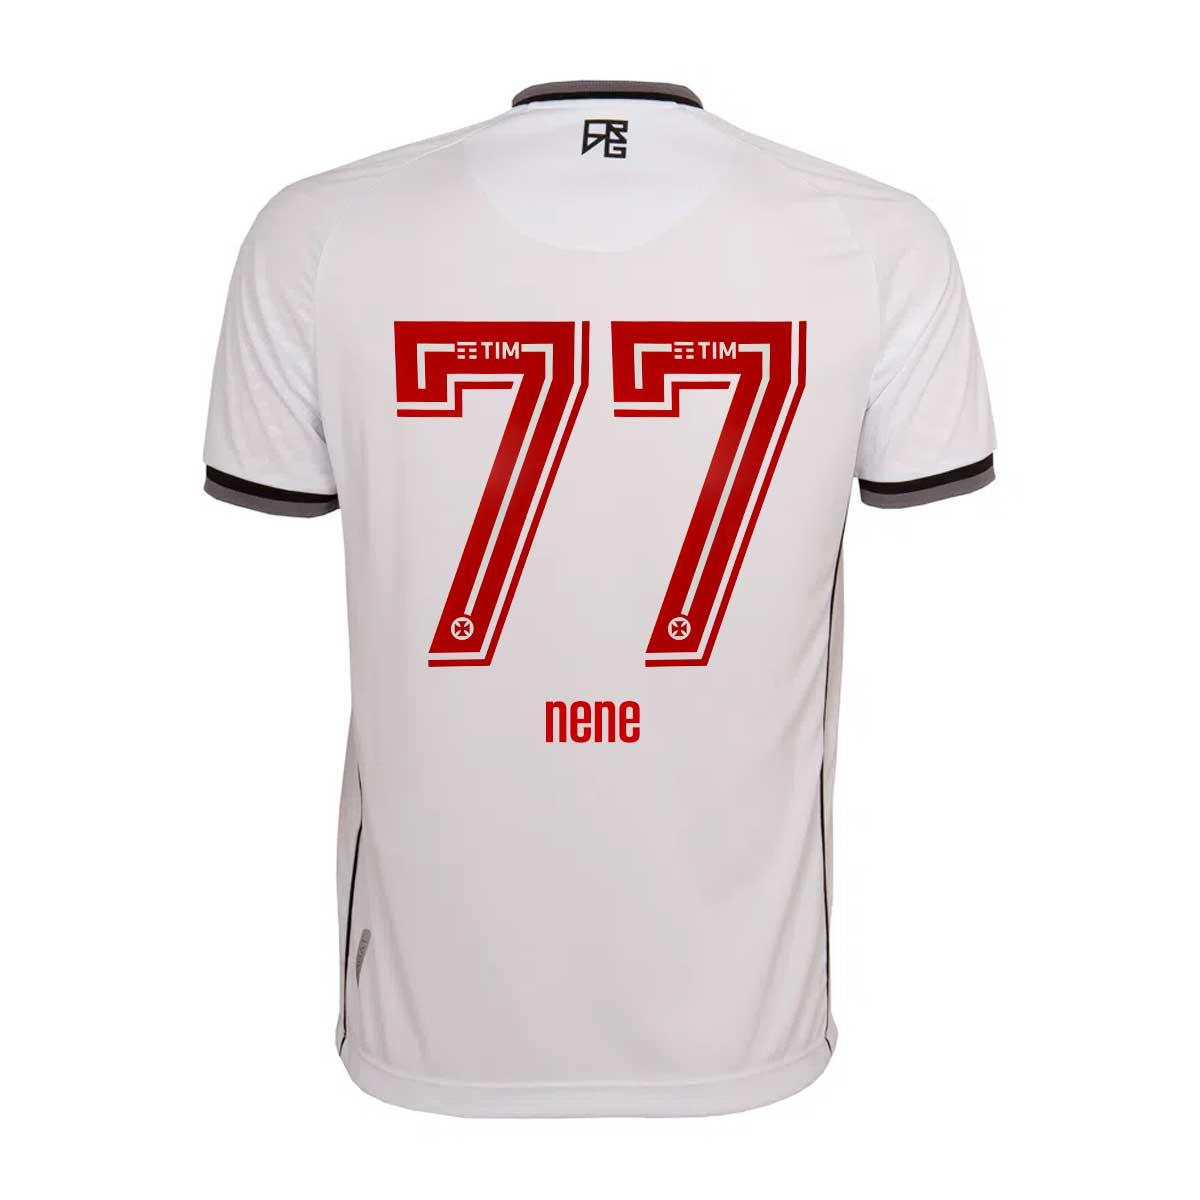 Camisa Vasco Jogo 2 Kappa 2021 - NENÊ